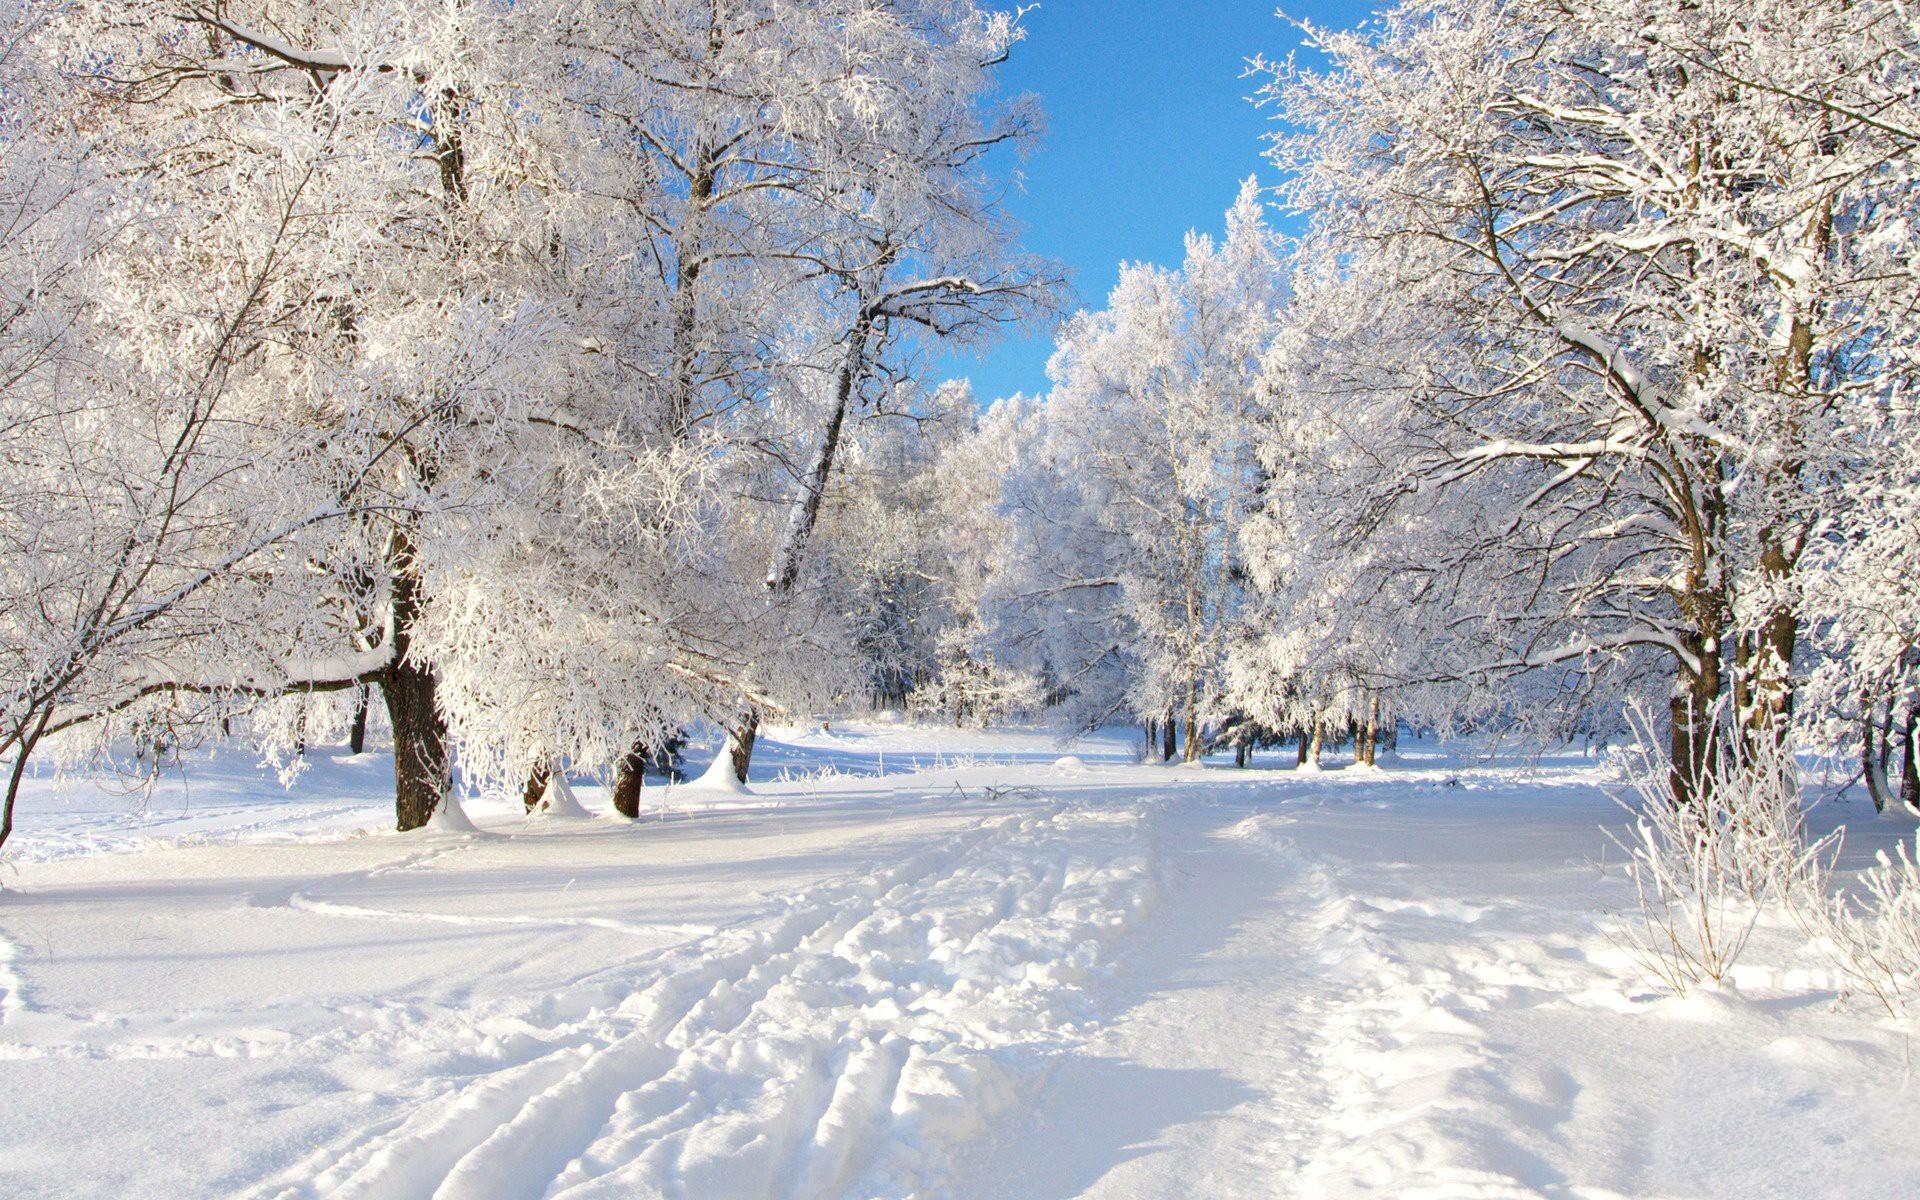 65+ winter desktop backgrounds ·① download free stunning wallpapers